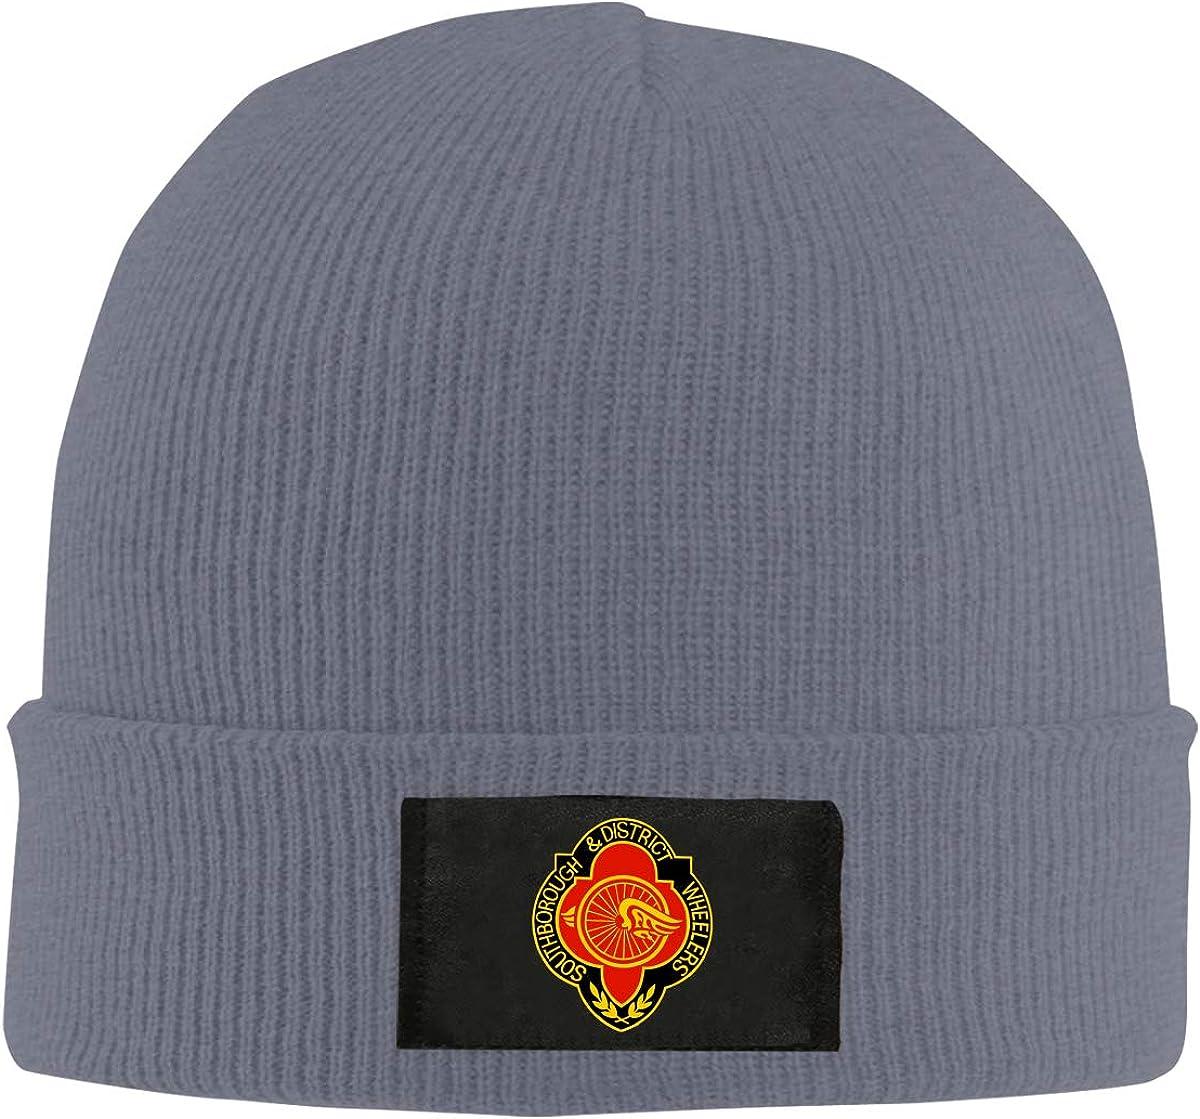 Xdinfong Southborough Wheelers Winter Beanie Hat Knit Hat Cap for Men /& Women